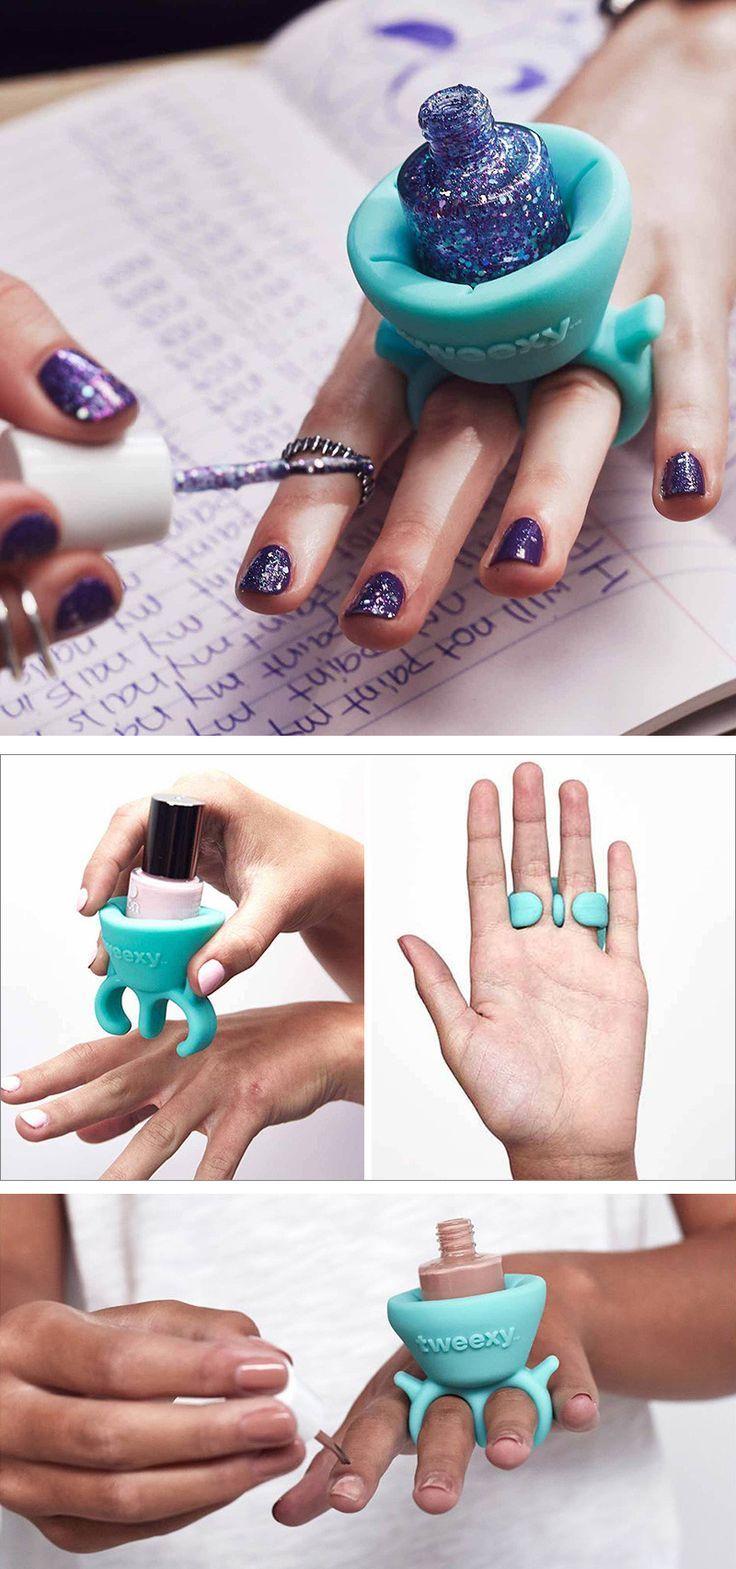 163 best Nails images on Pinterest | Belle nails, Bridal nail art ...